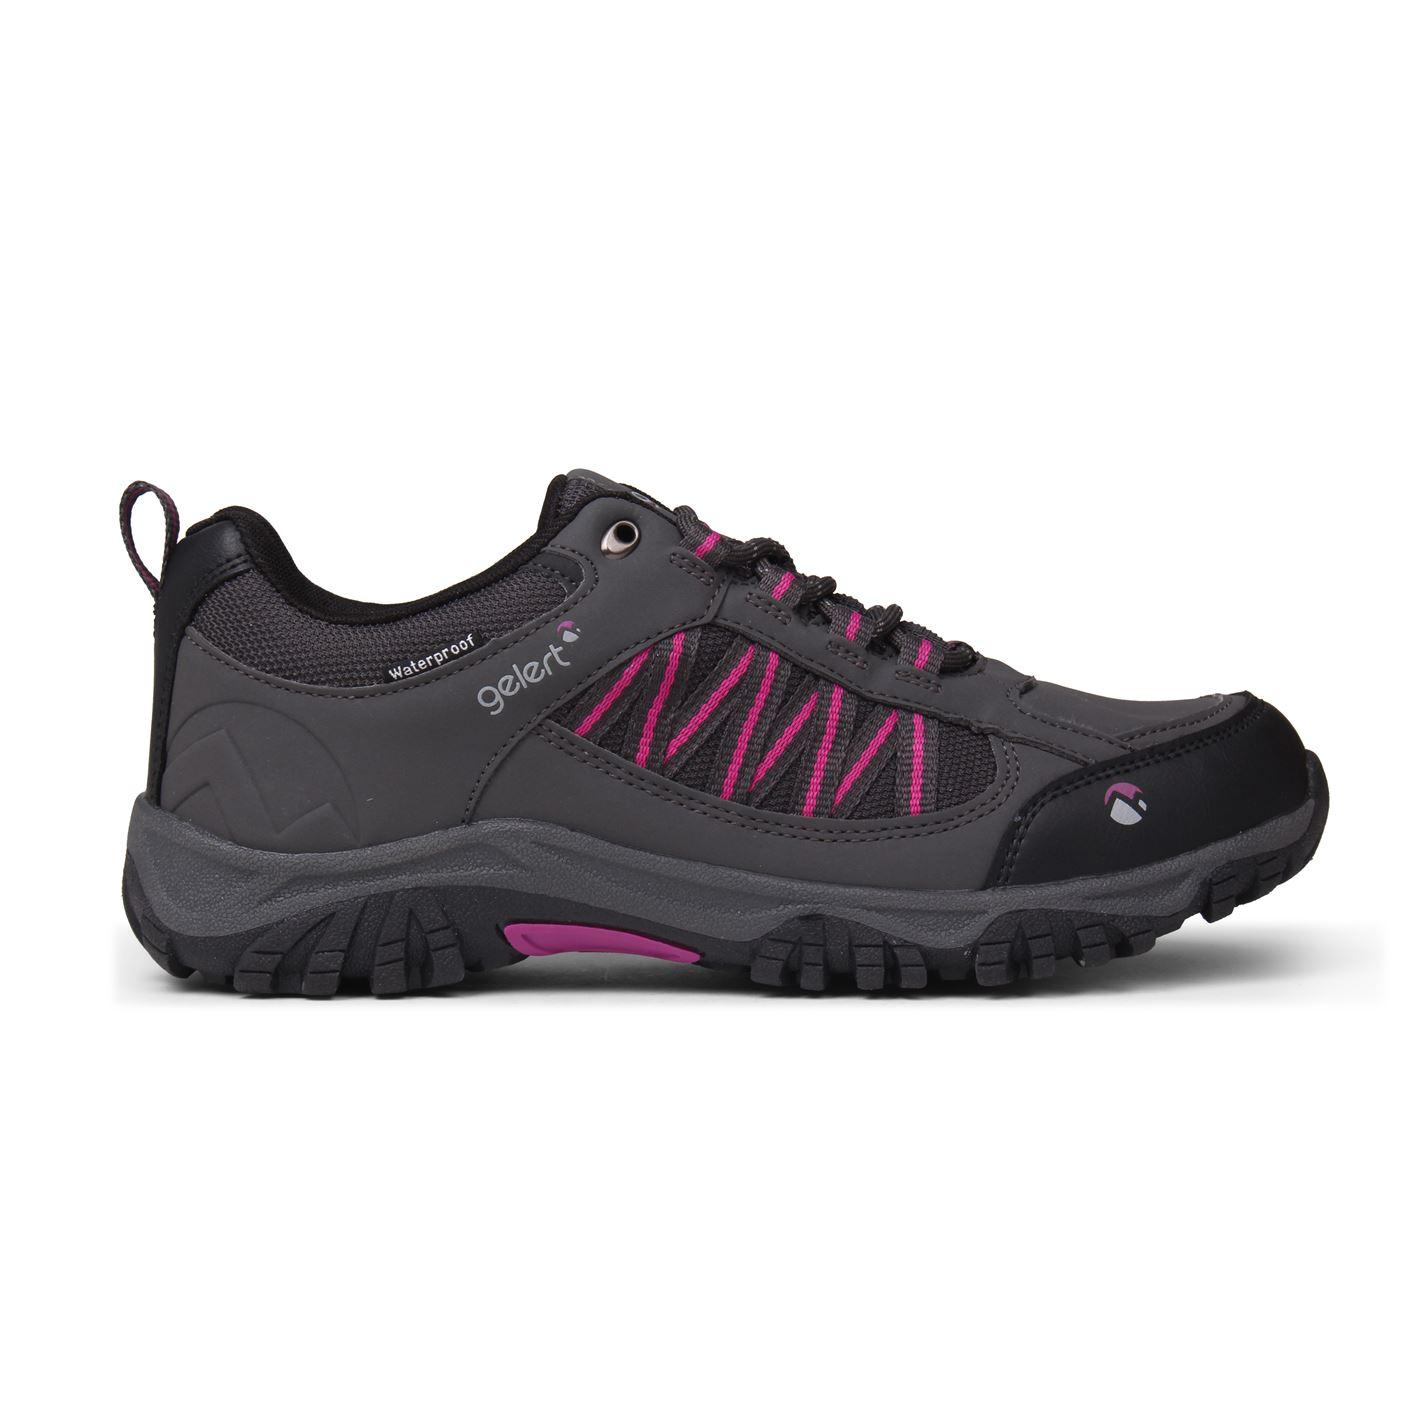 Ženske outdoor cipele Gelert 18741826